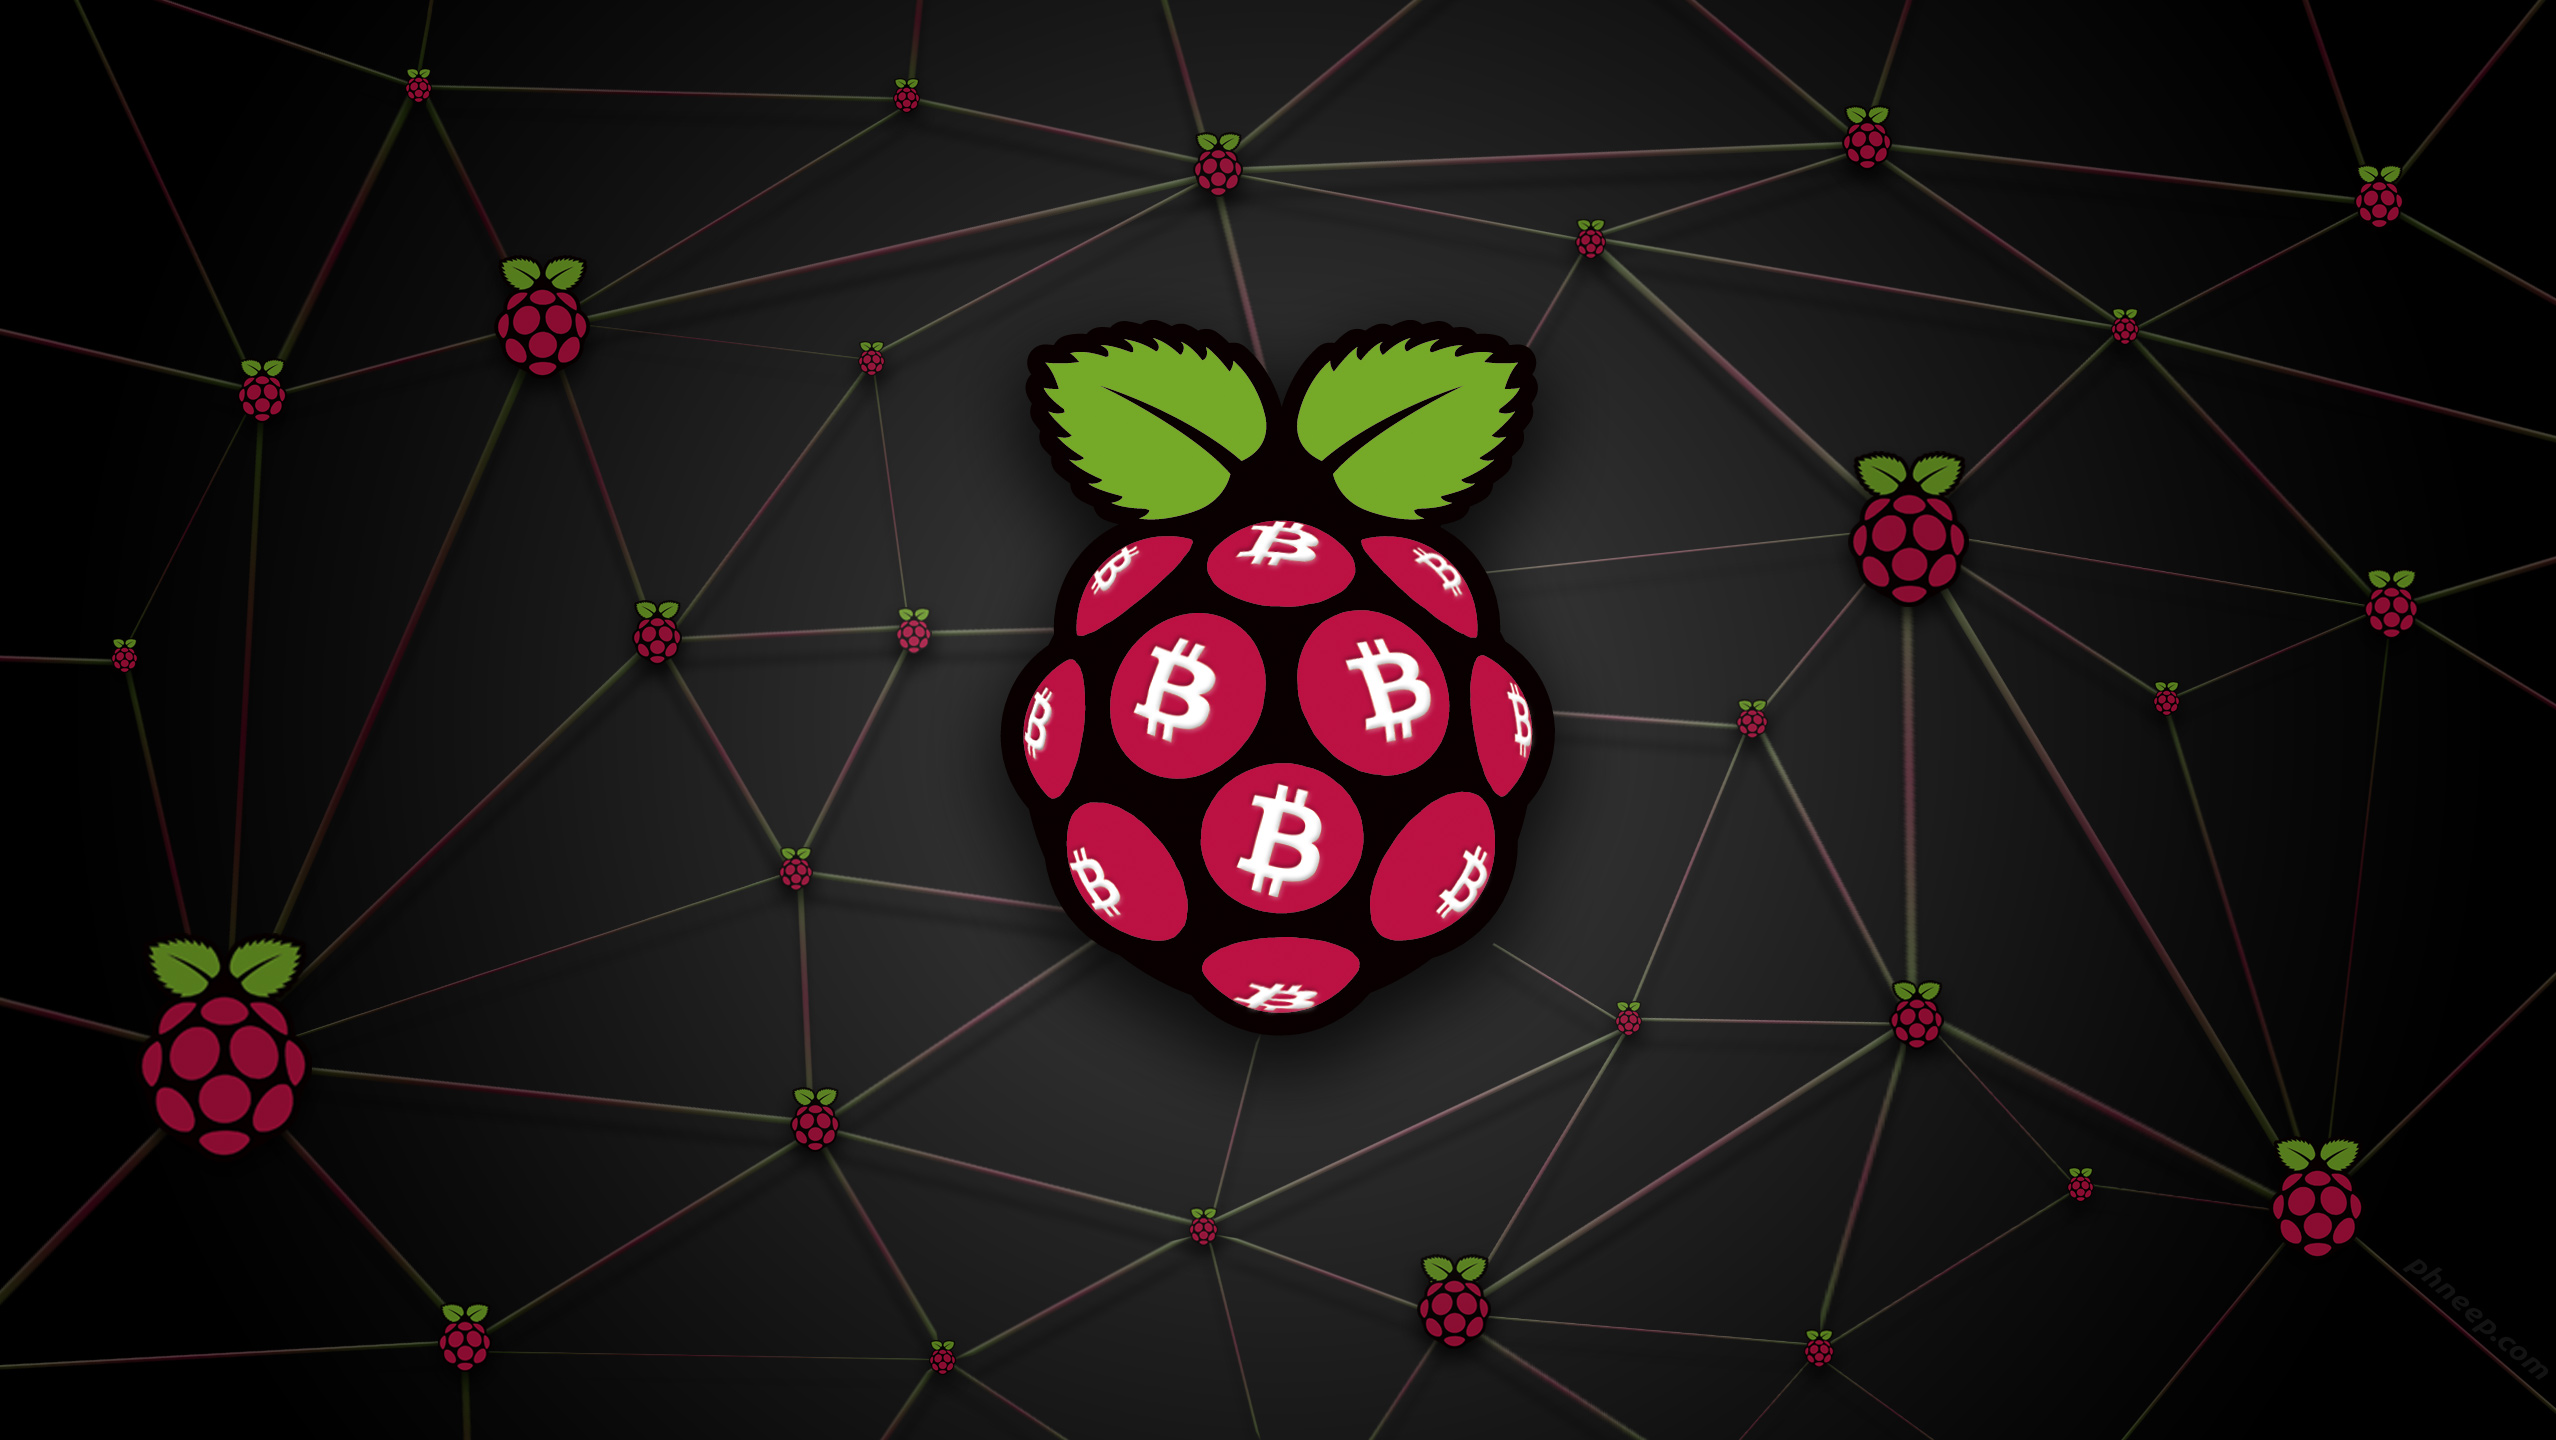 Raspberry-Pi-Bitcoin-ntwrk